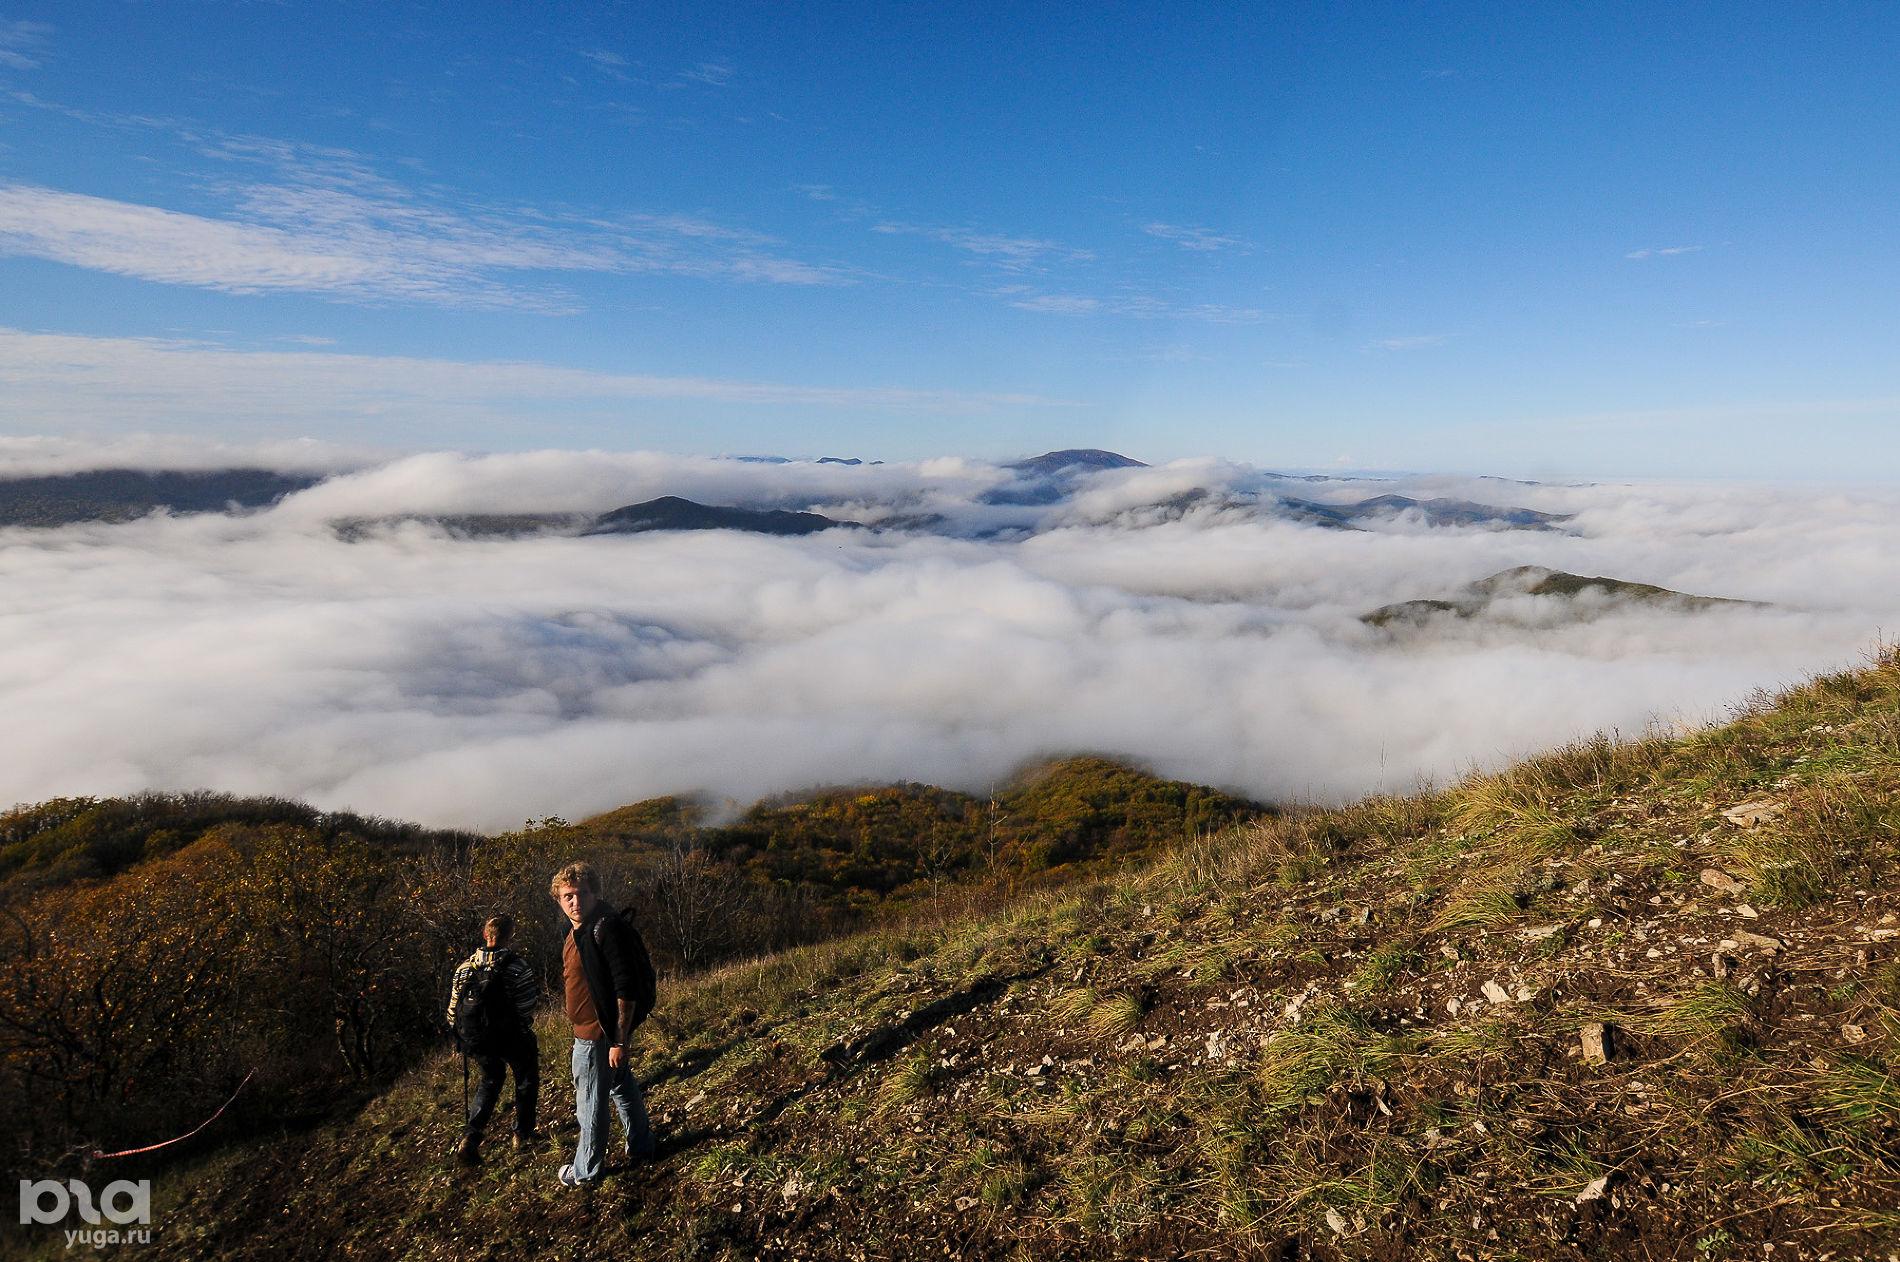 Гора Собер-Баш ©Фото Елены Синеок, Юга.ру